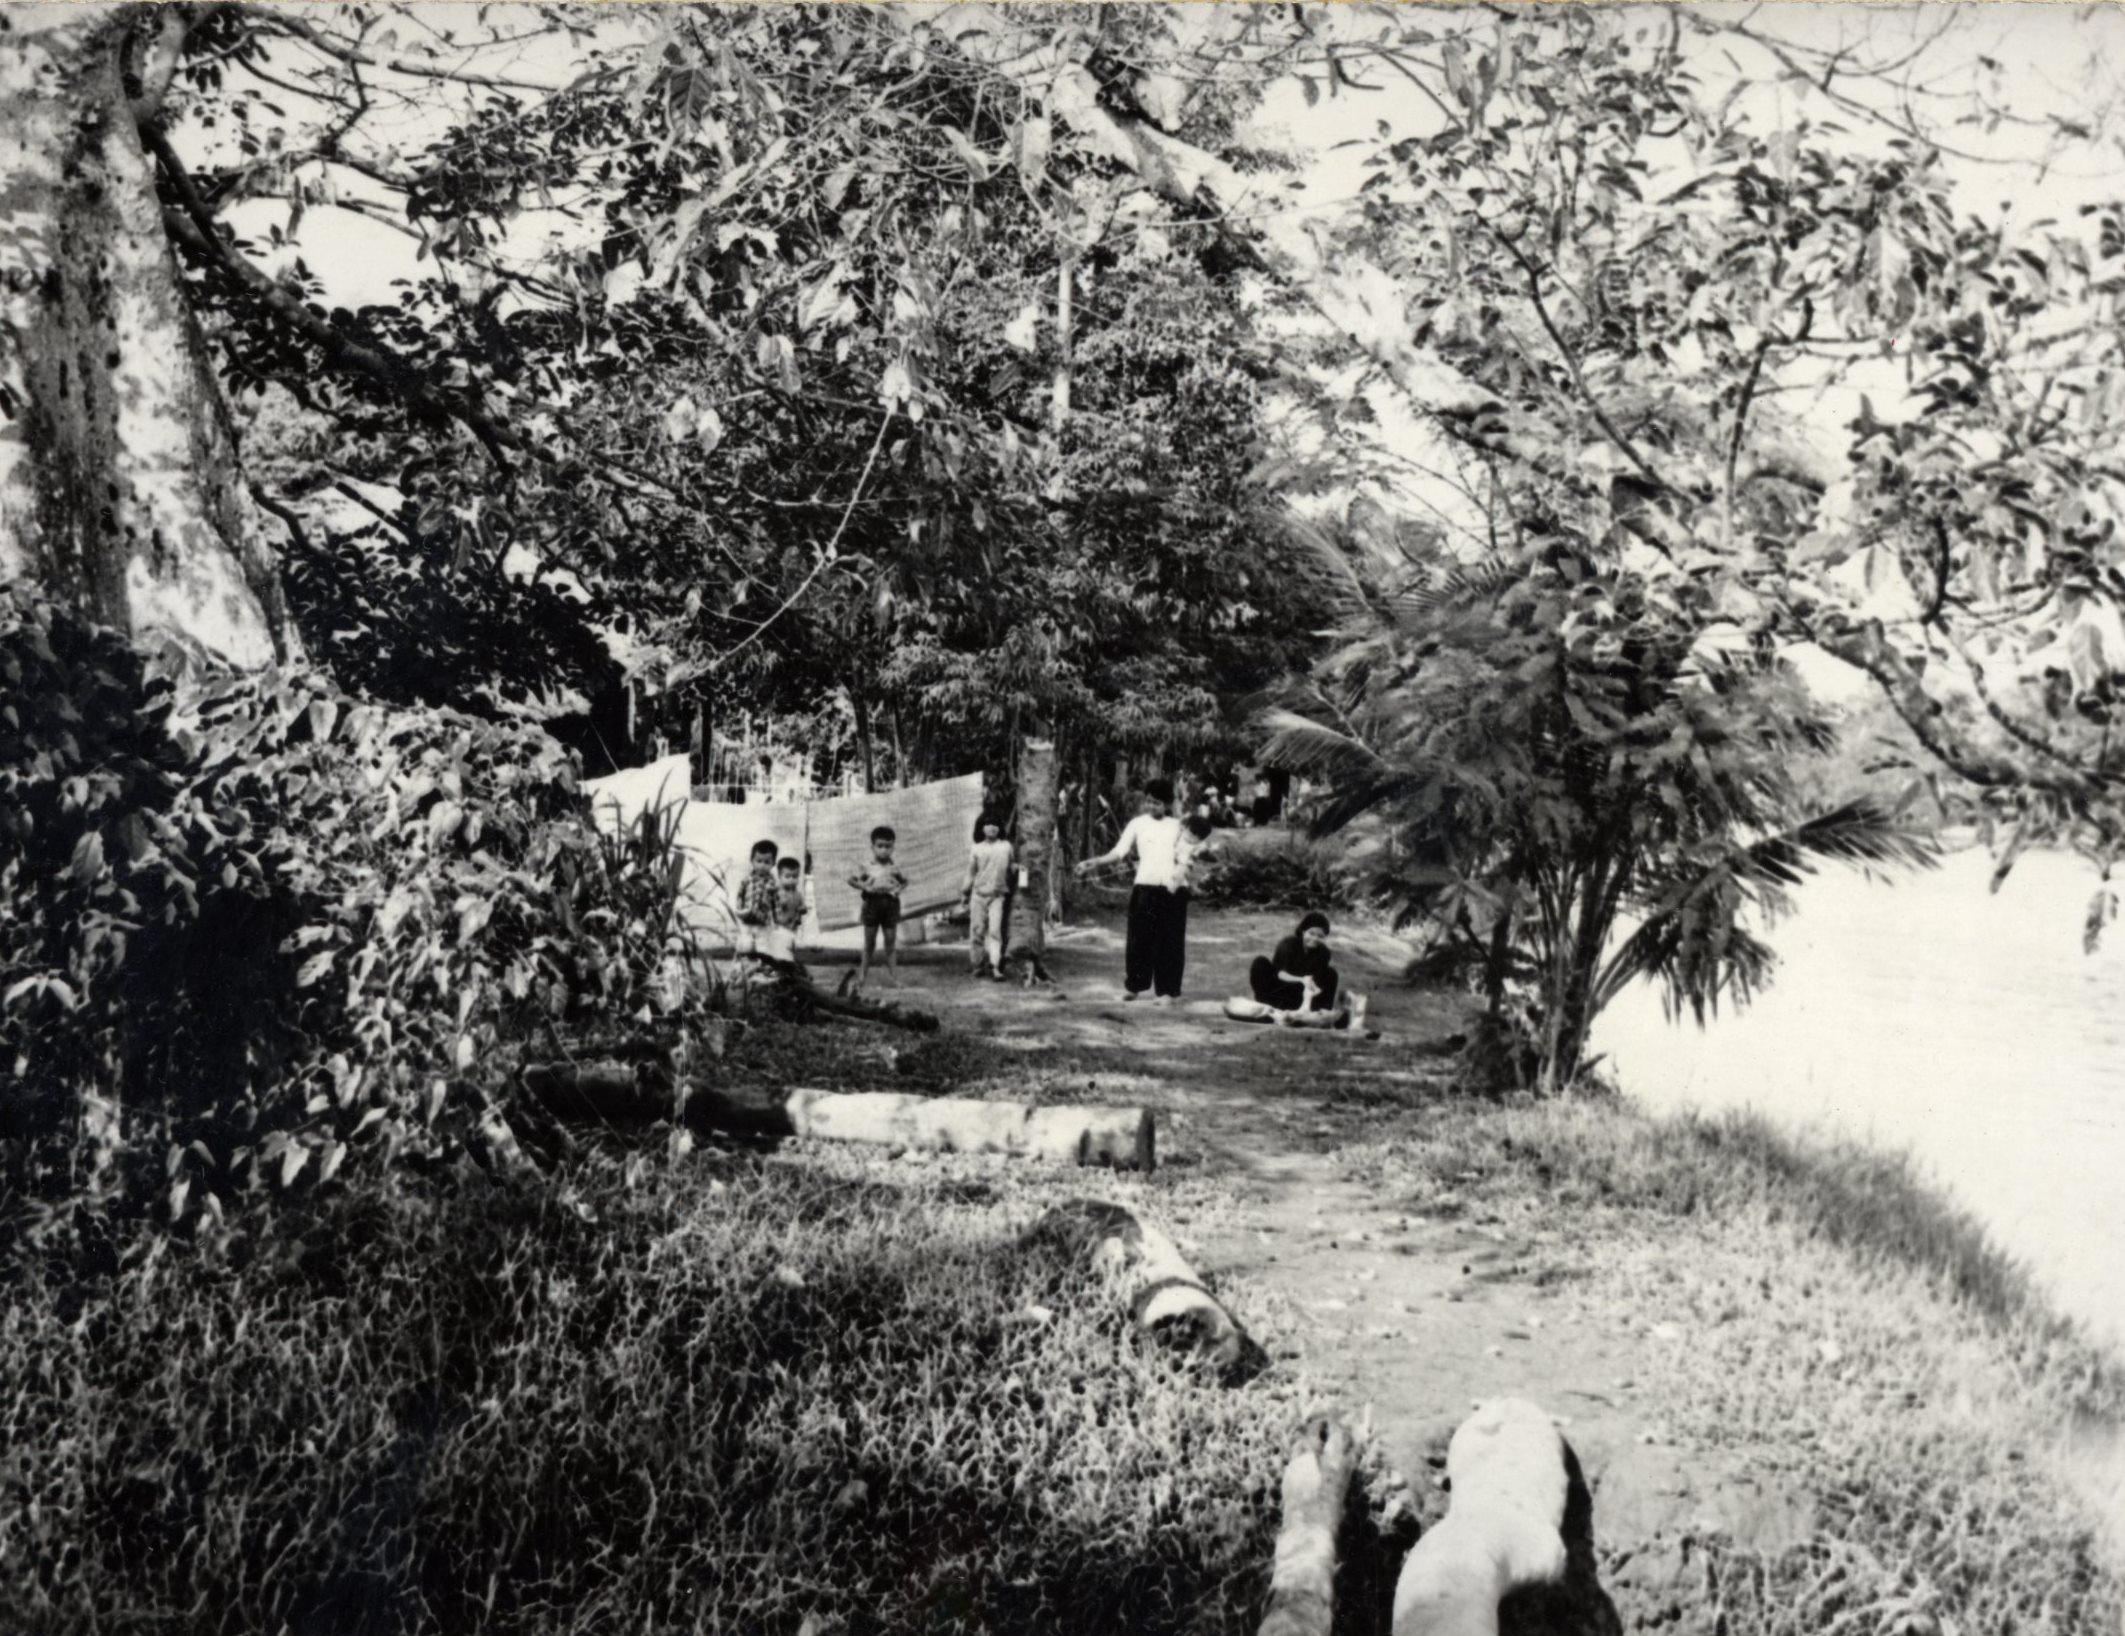 Family near Cai Rang River, Vietnam